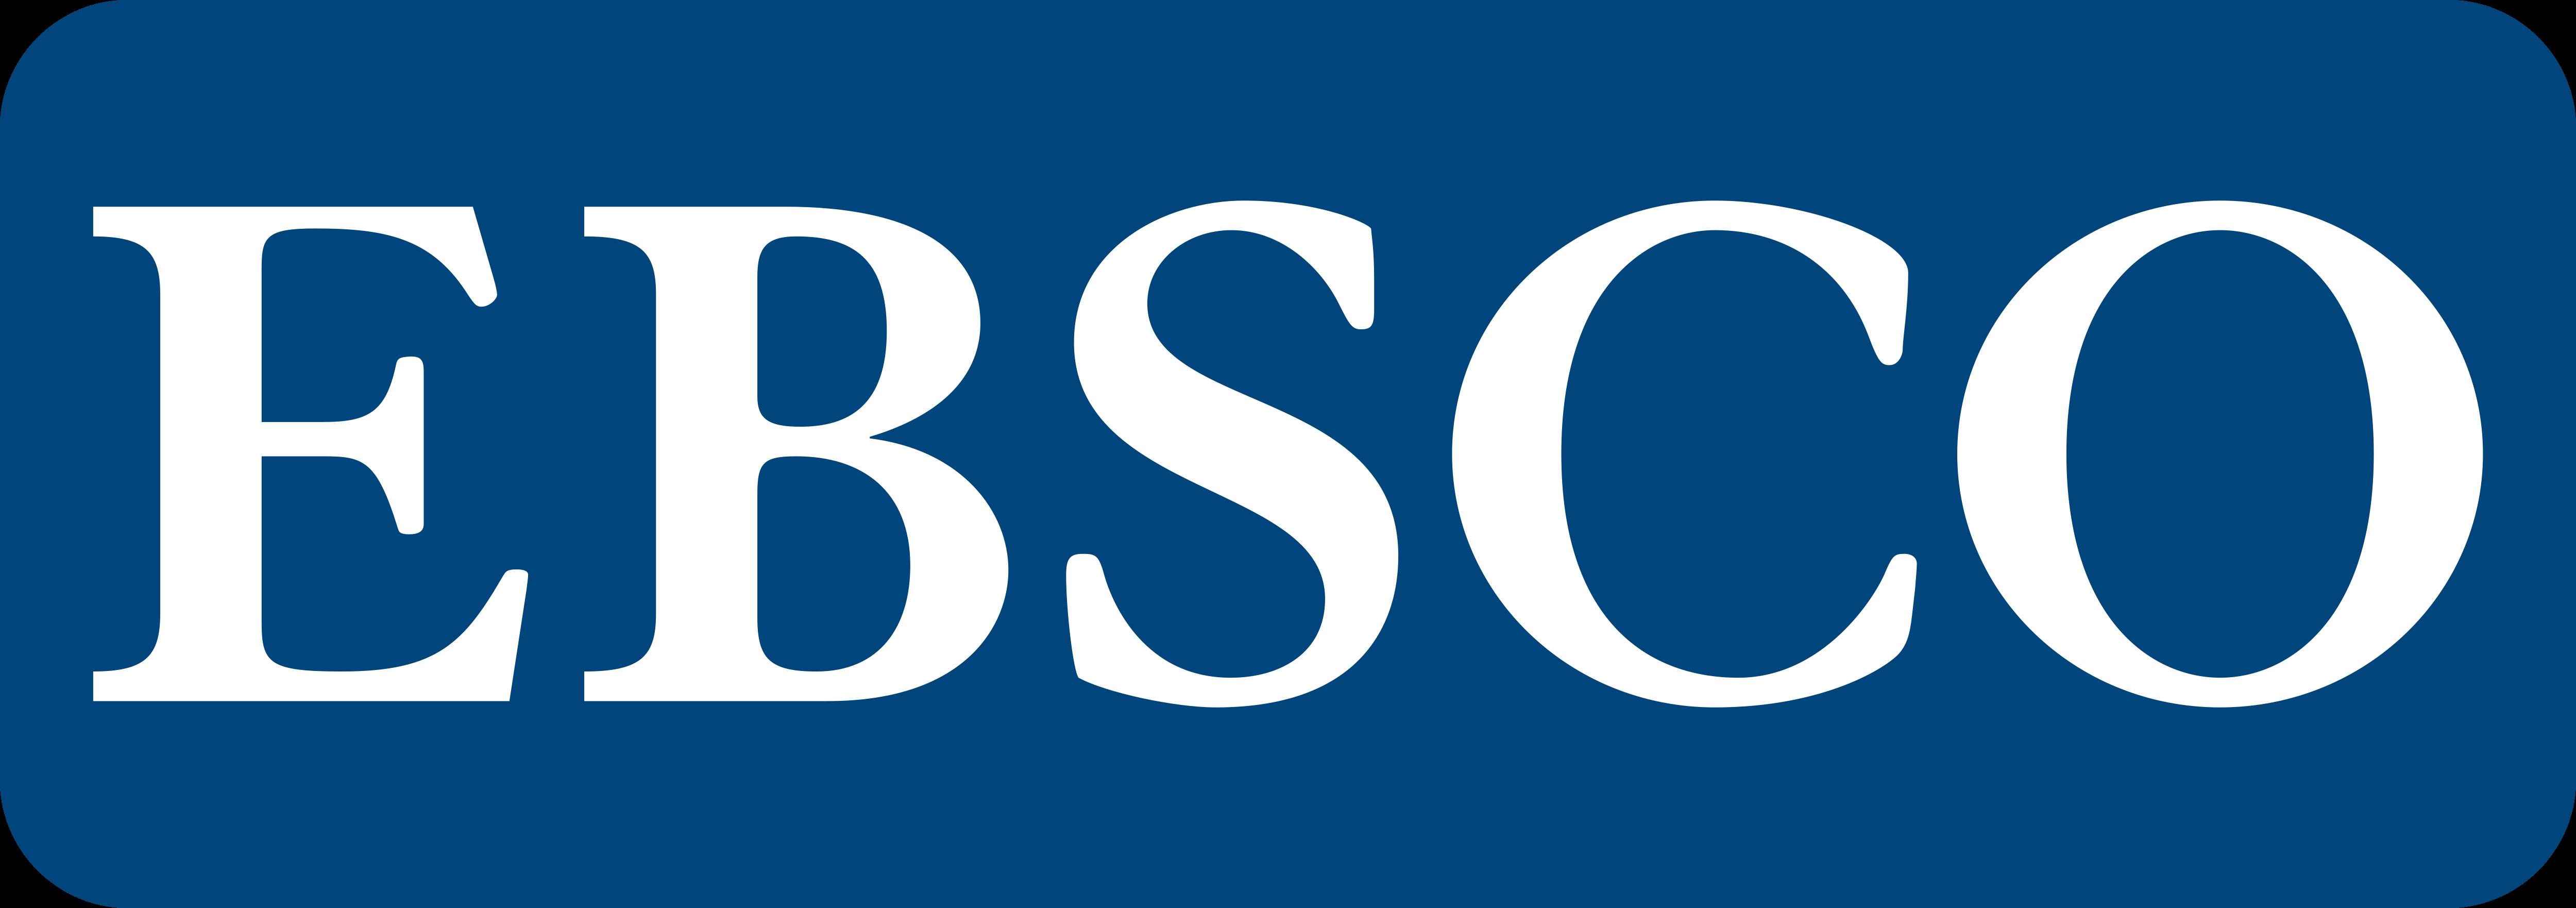 EBSCO – Logo